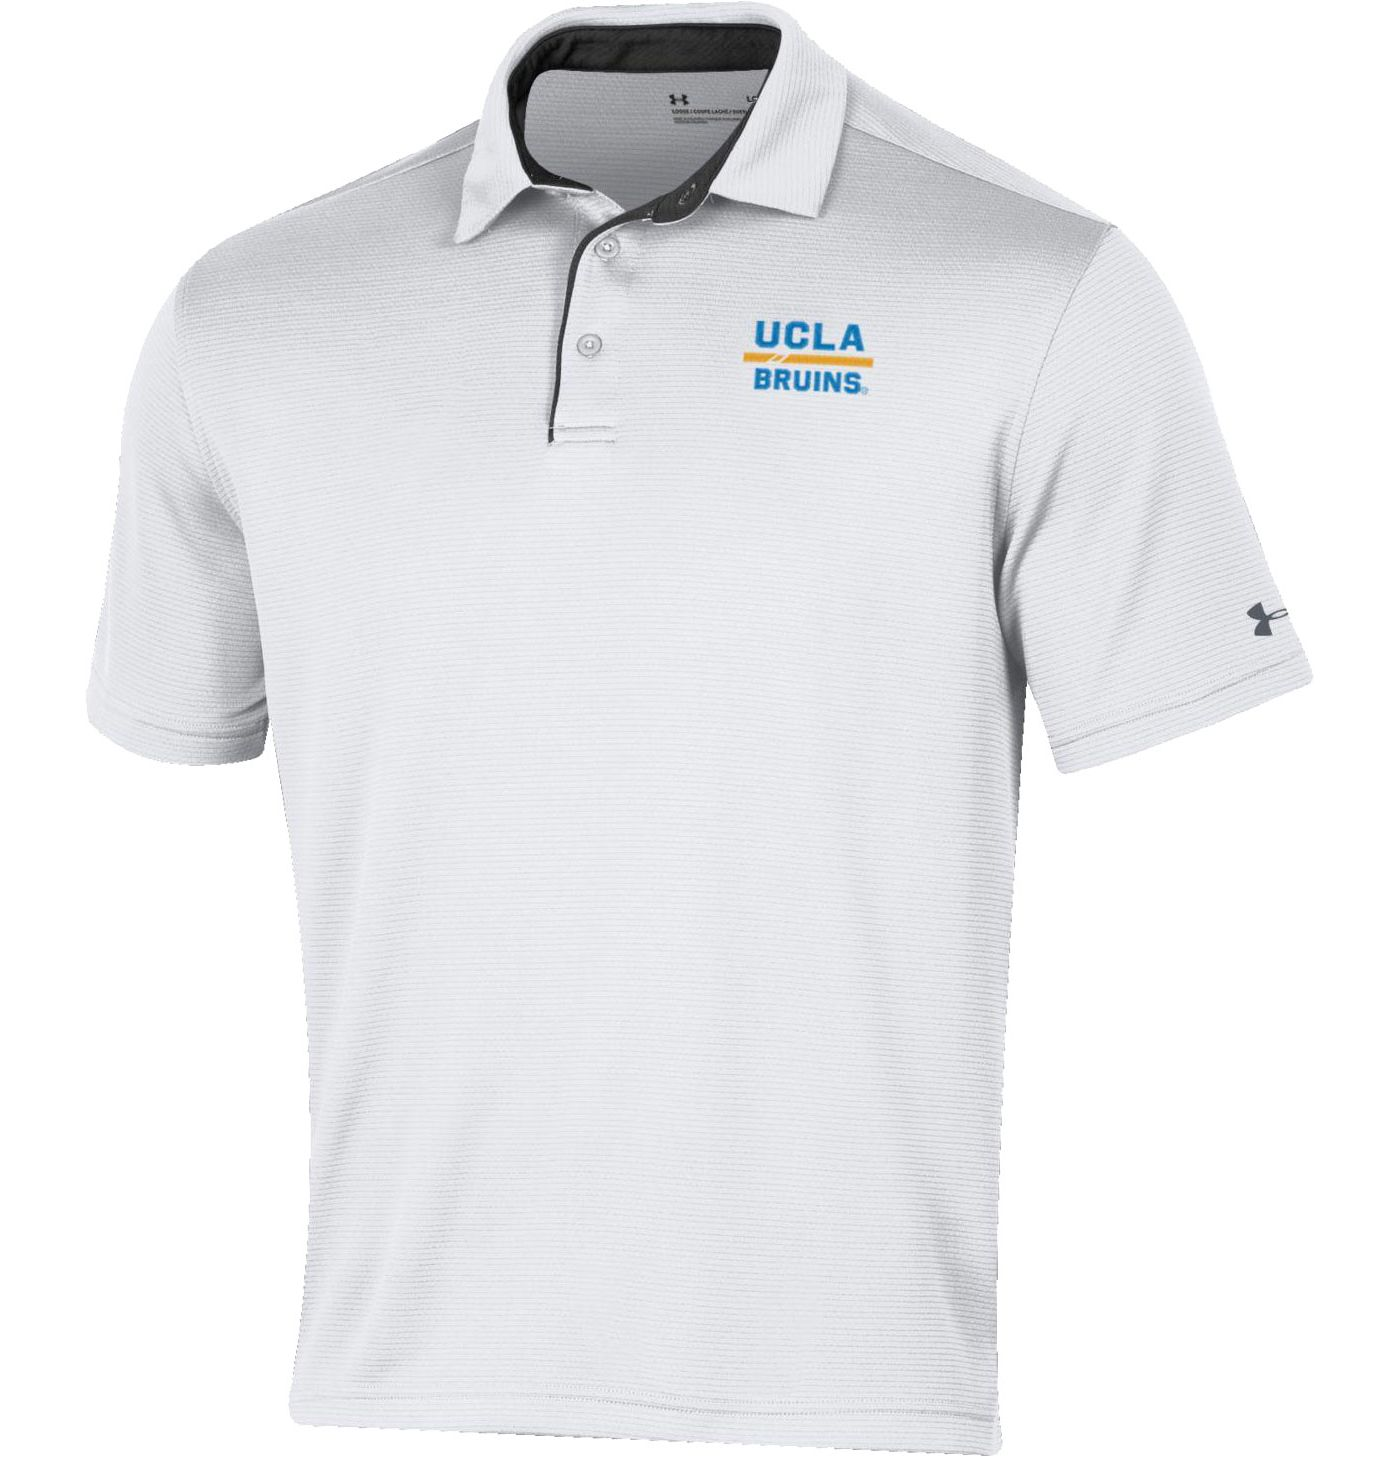 Under Armour Men's UCLA Bruins Tech White Polo